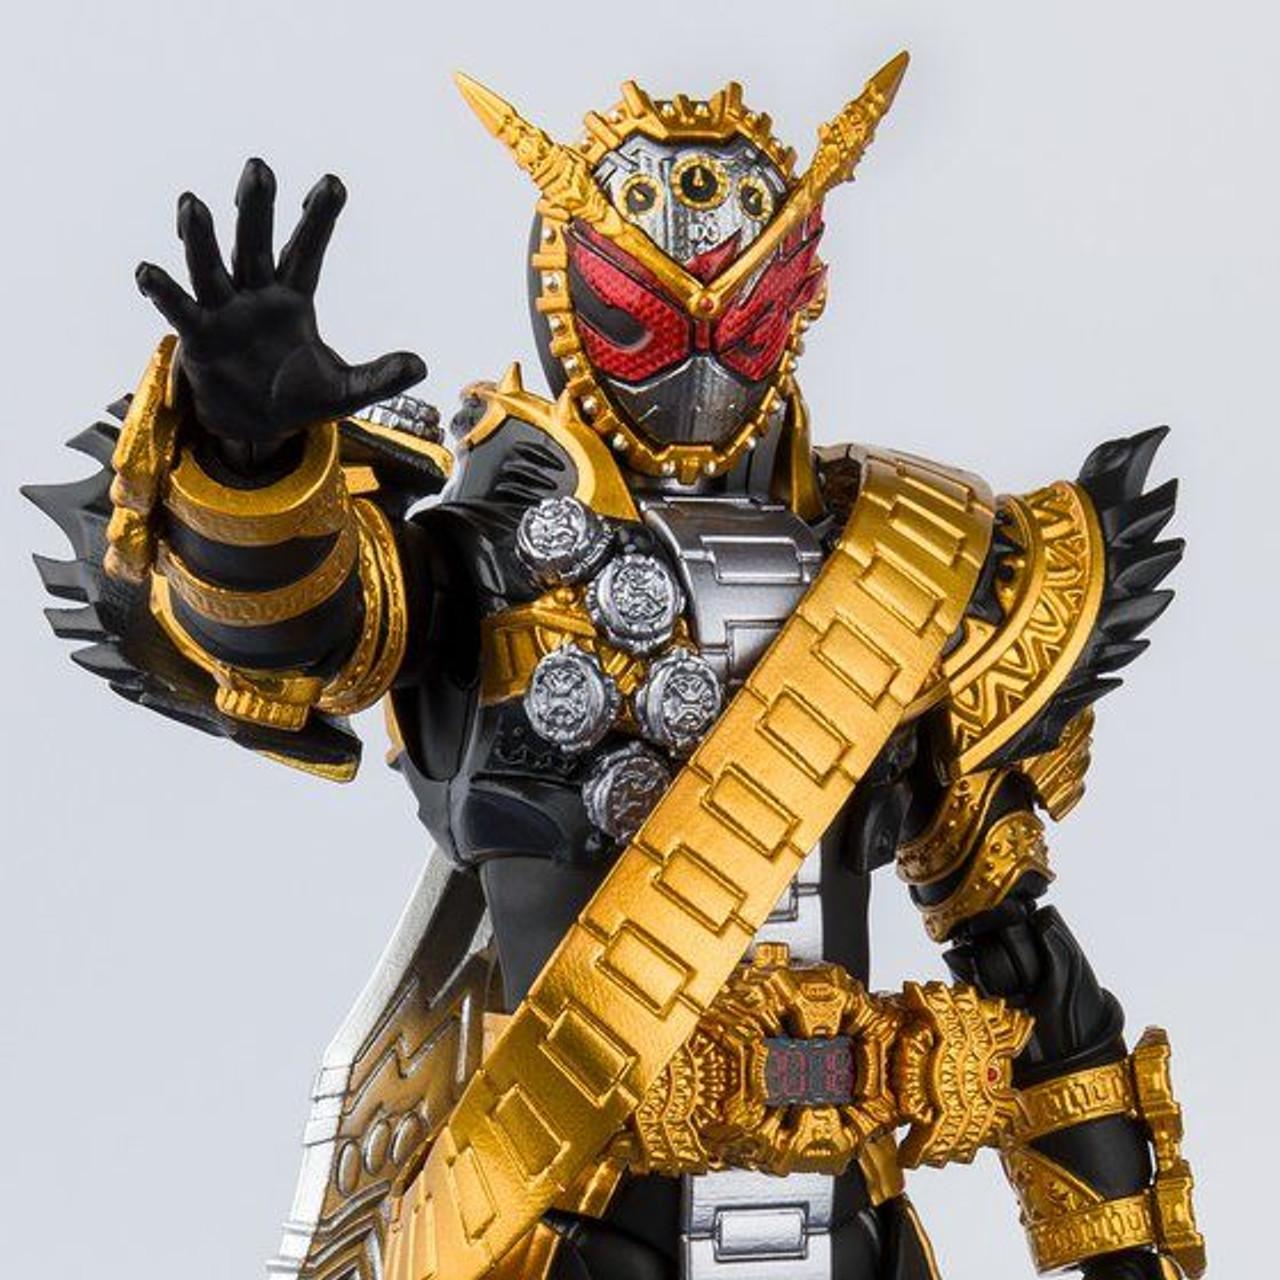 Pre-order Kamen Rider ZI-O DX OHMA ZI-O Driver P-Bandai JAPAN Limited